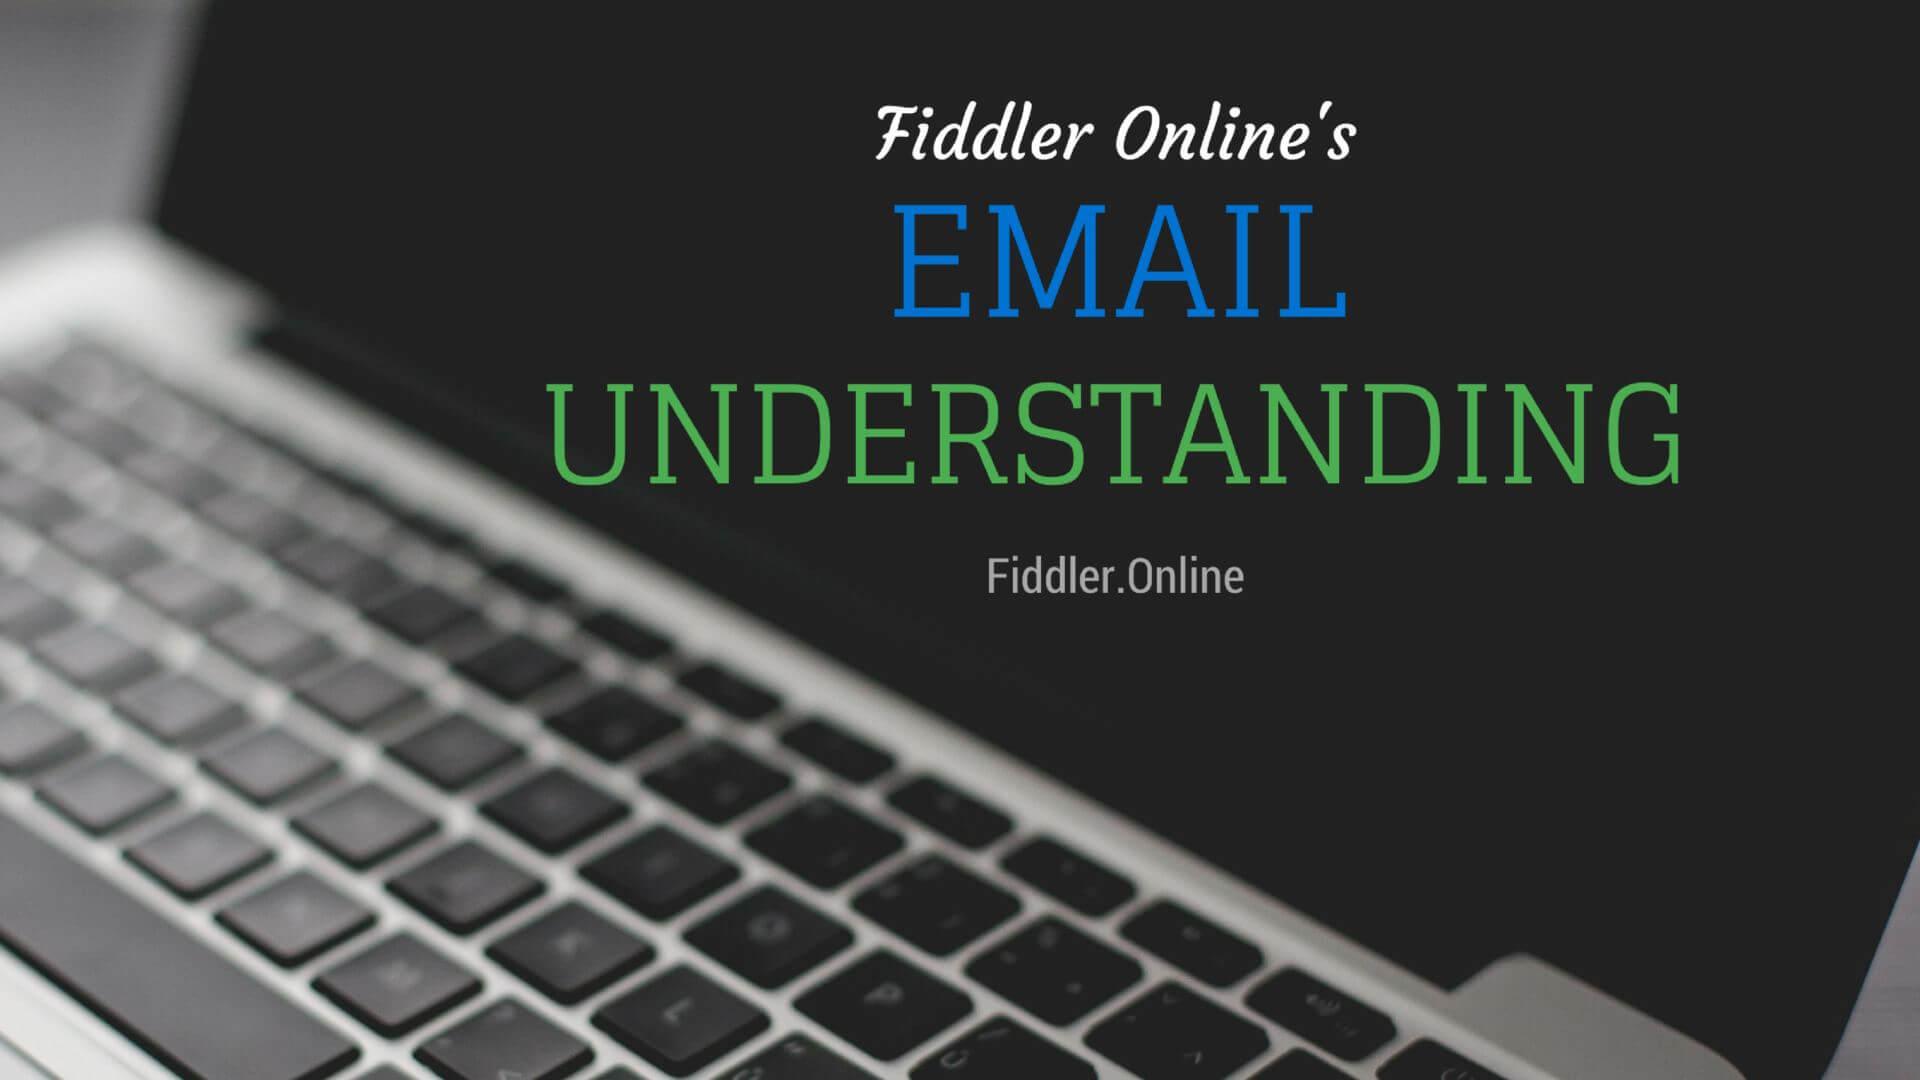 Email understanding fiddler online